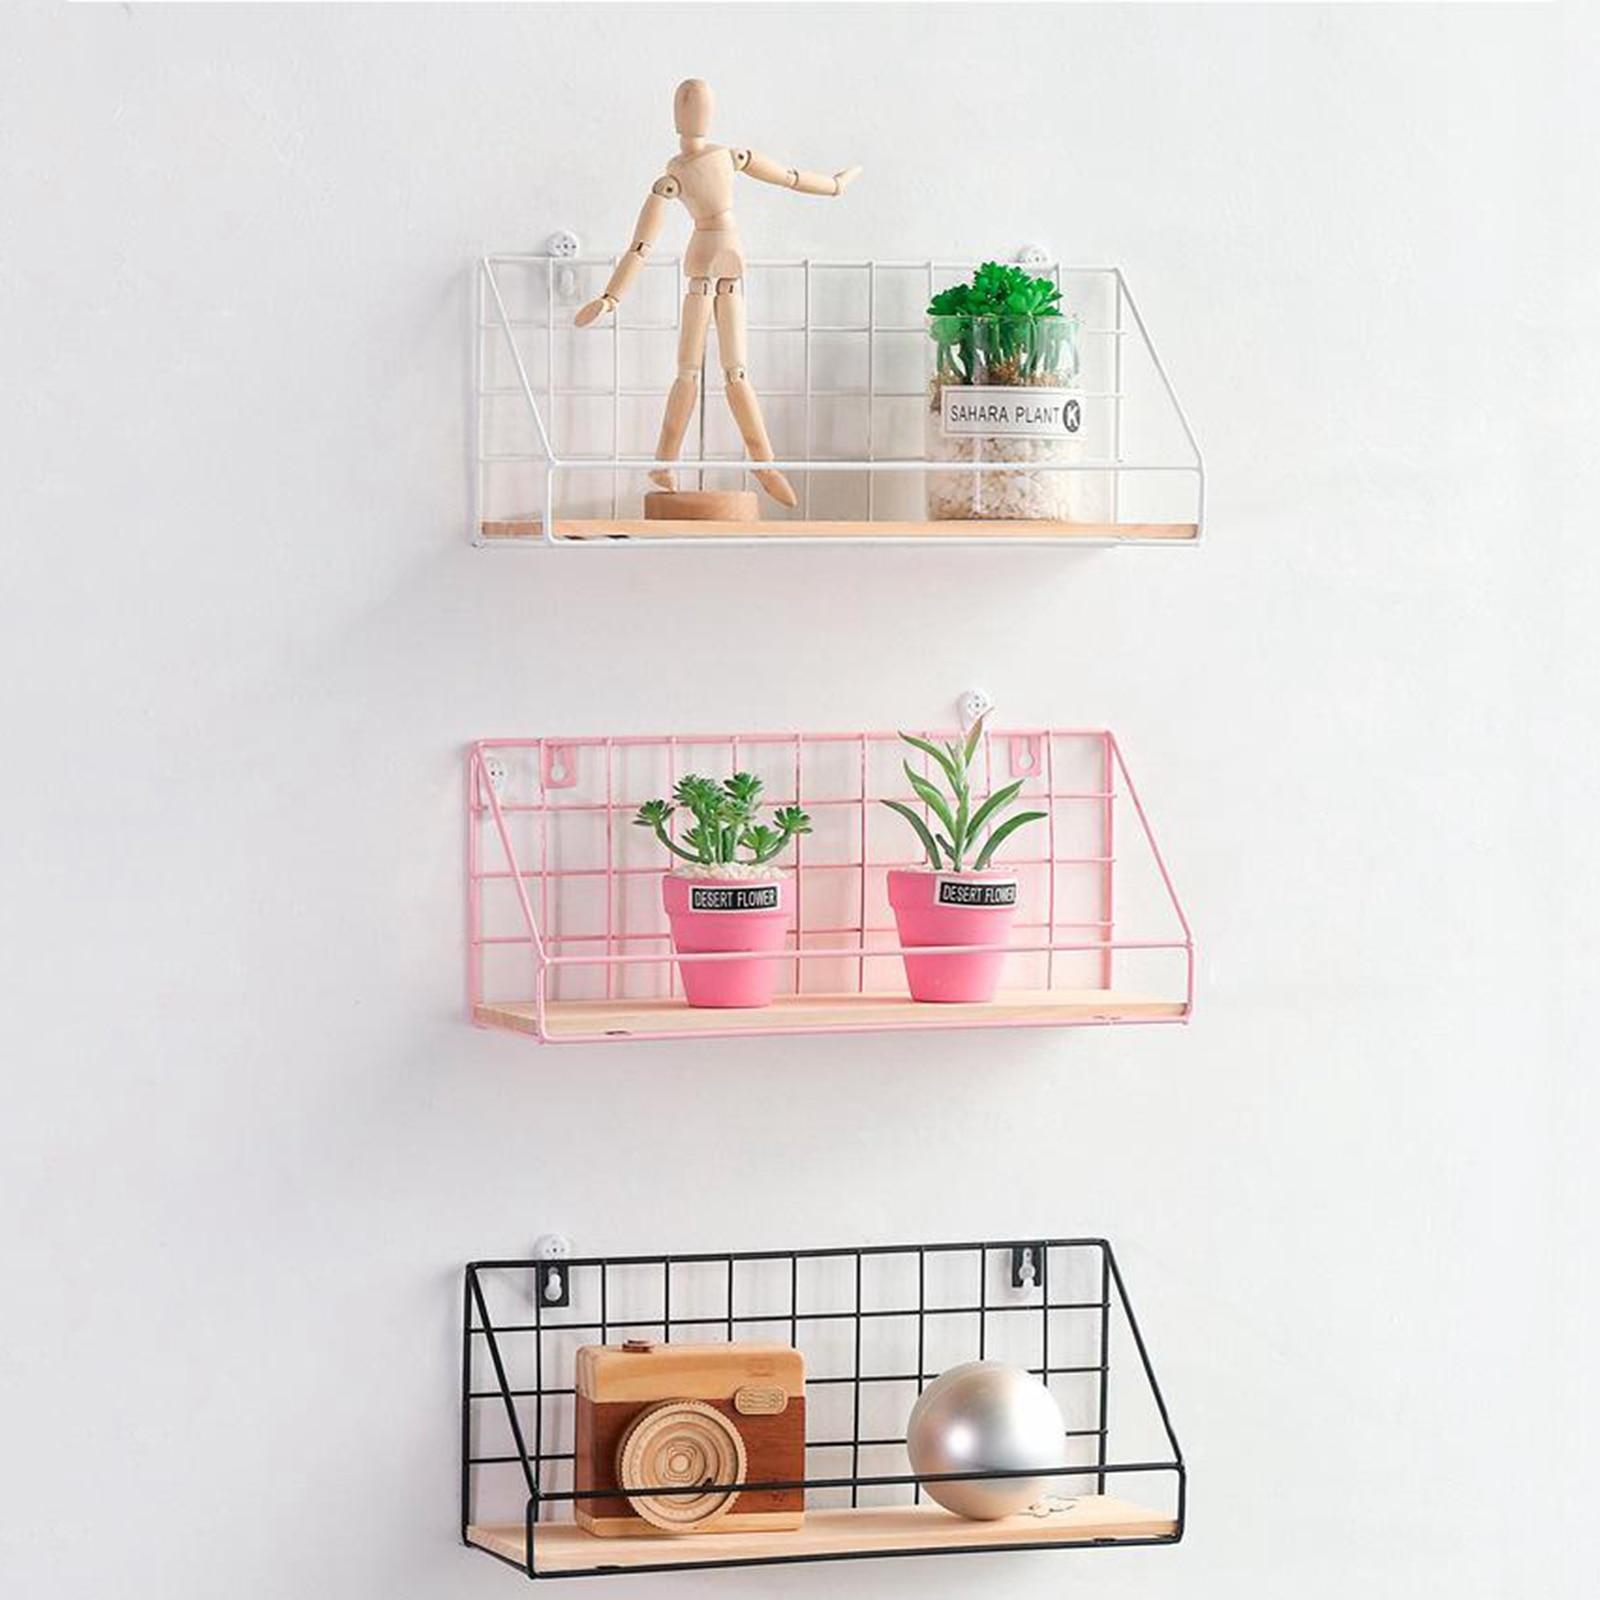 Nordic Wall Decoration Storage Shelf Vintage Metal Iron Wire Frame Storage Rack Decorative Wall Shelves